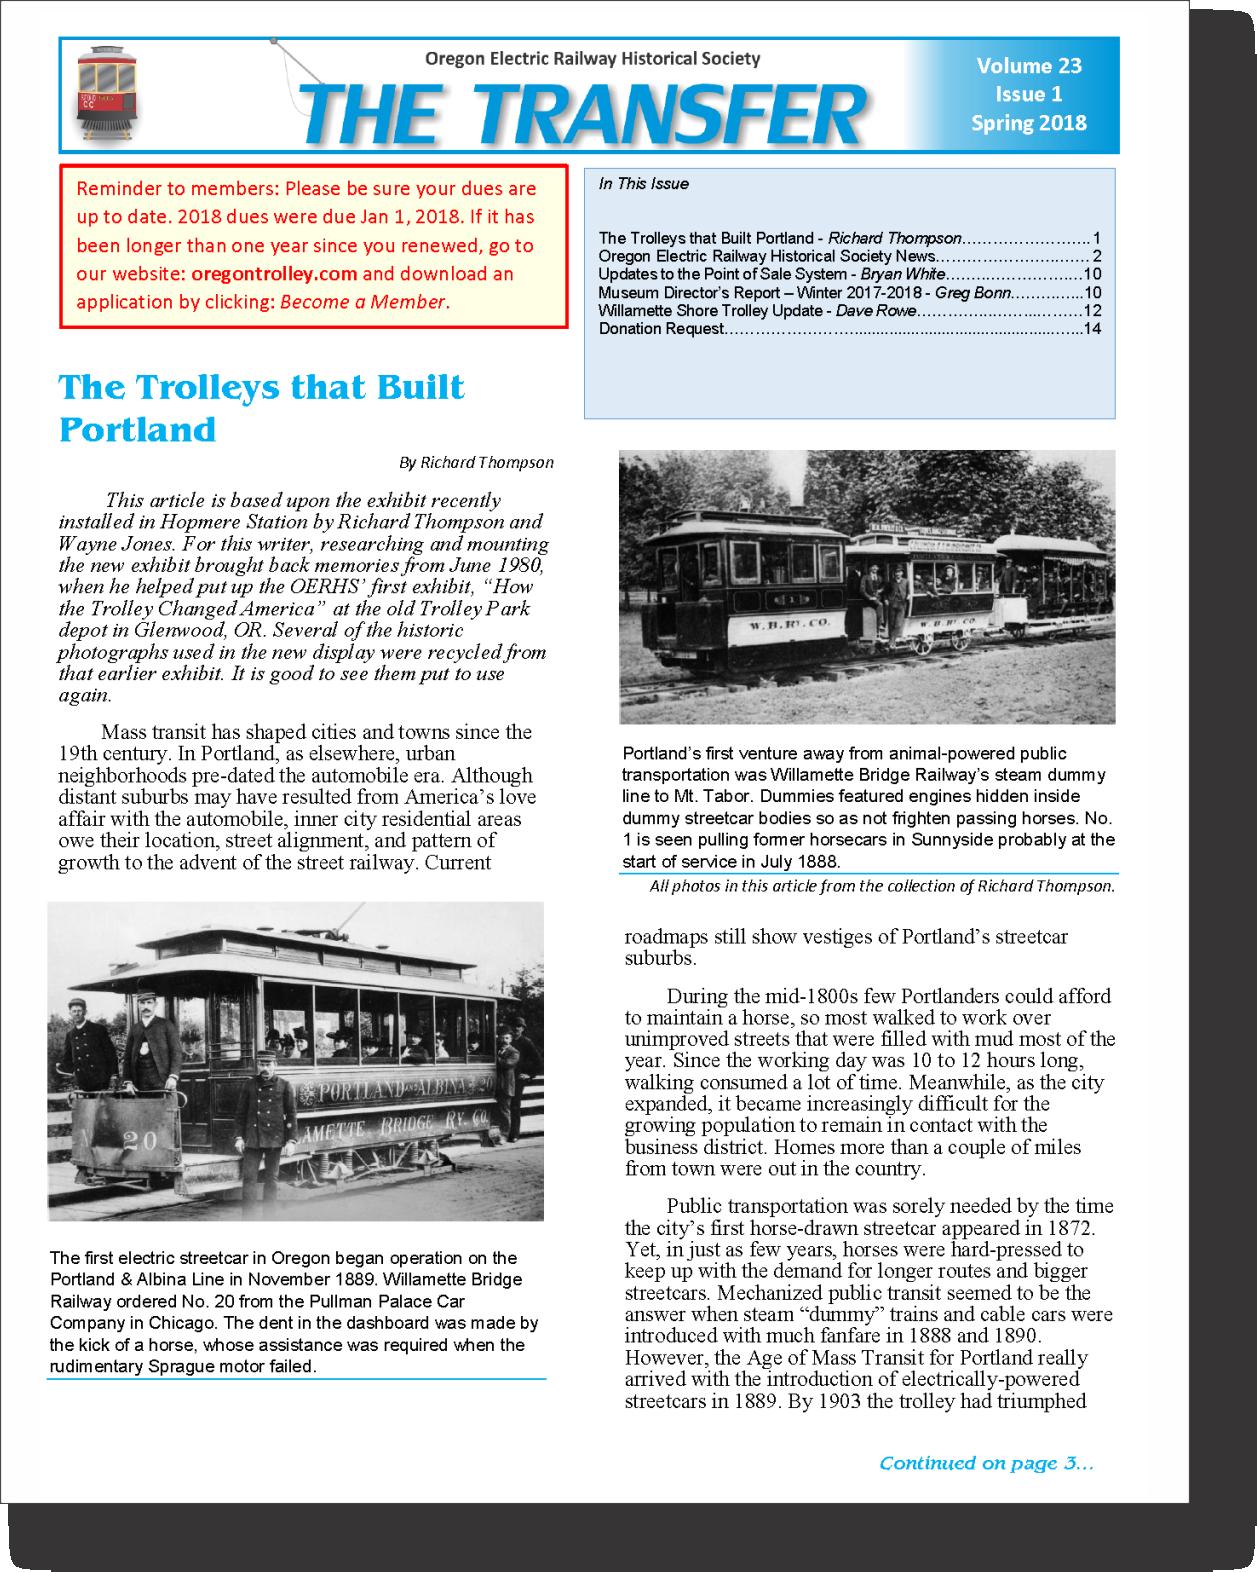 The Transfer - OERHS Newsletter